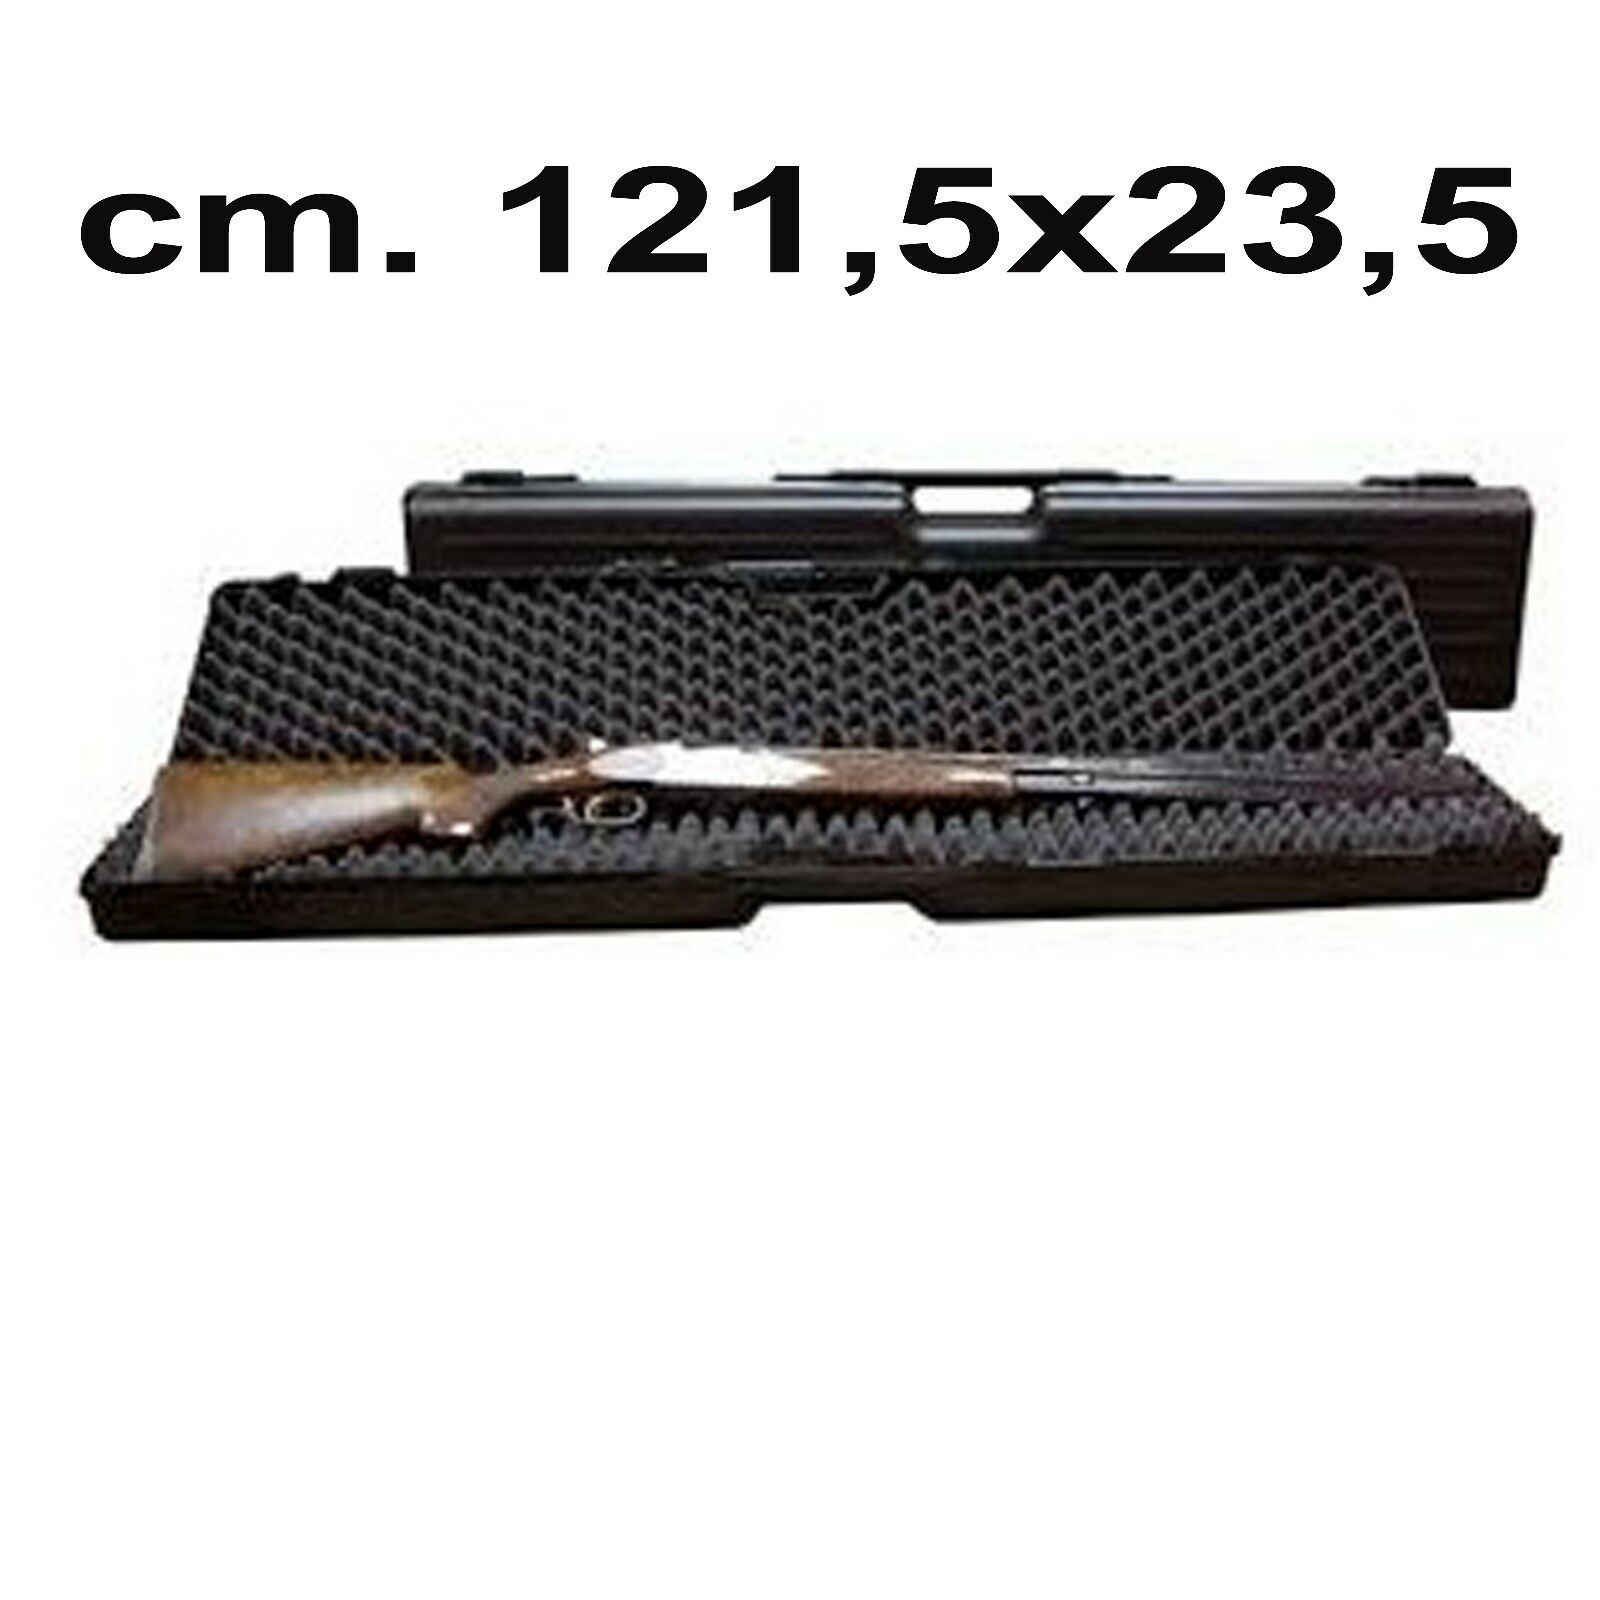 Custodia rigida per armi valigetta imbottita carabina fucile fodero in plastica